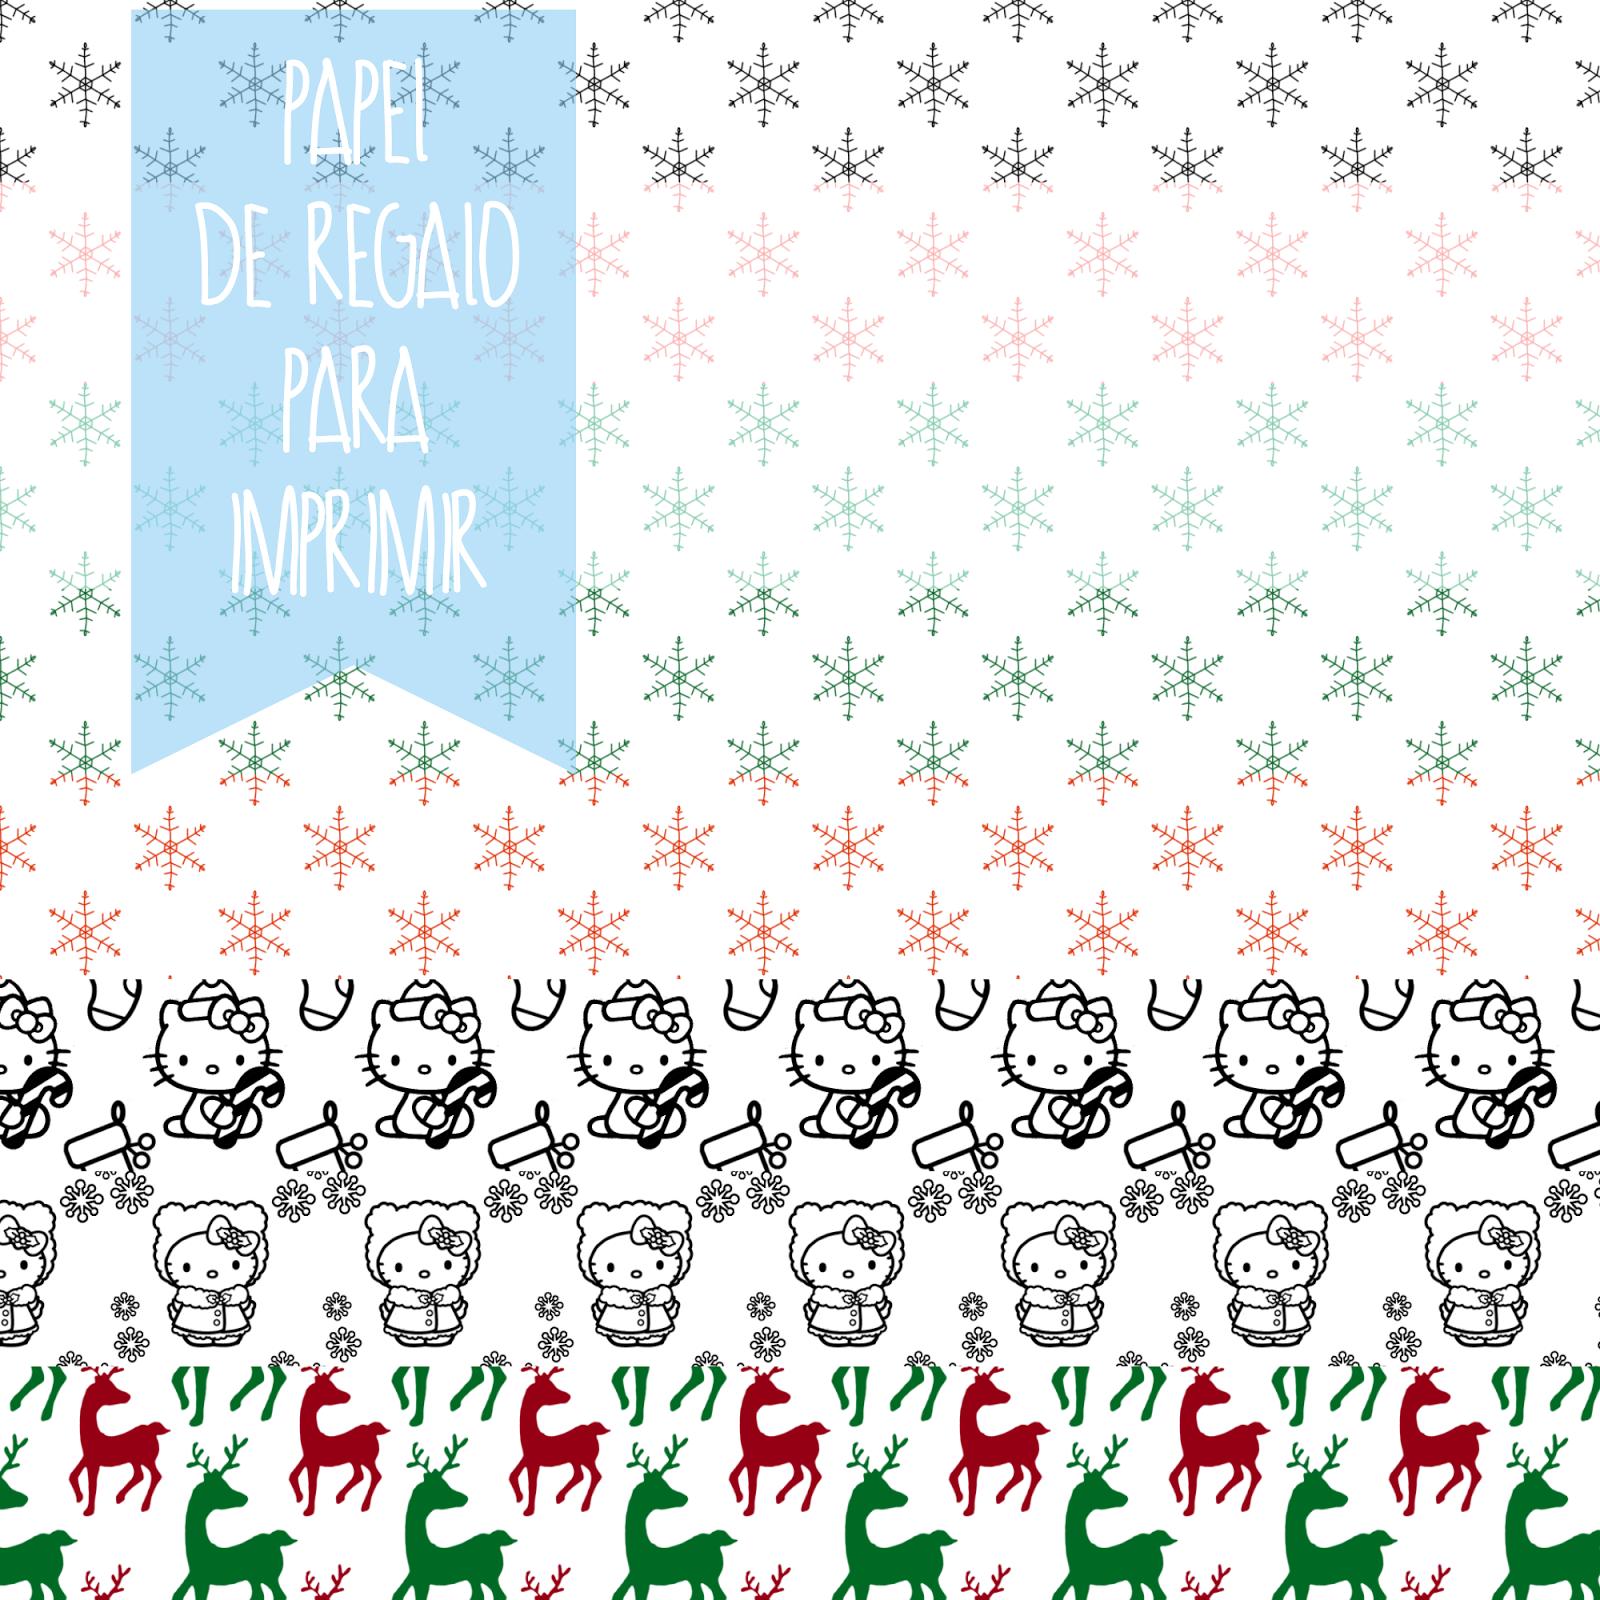 O Recuncho de Jei: Navidad modo on! Papeles de regalo para imprimir